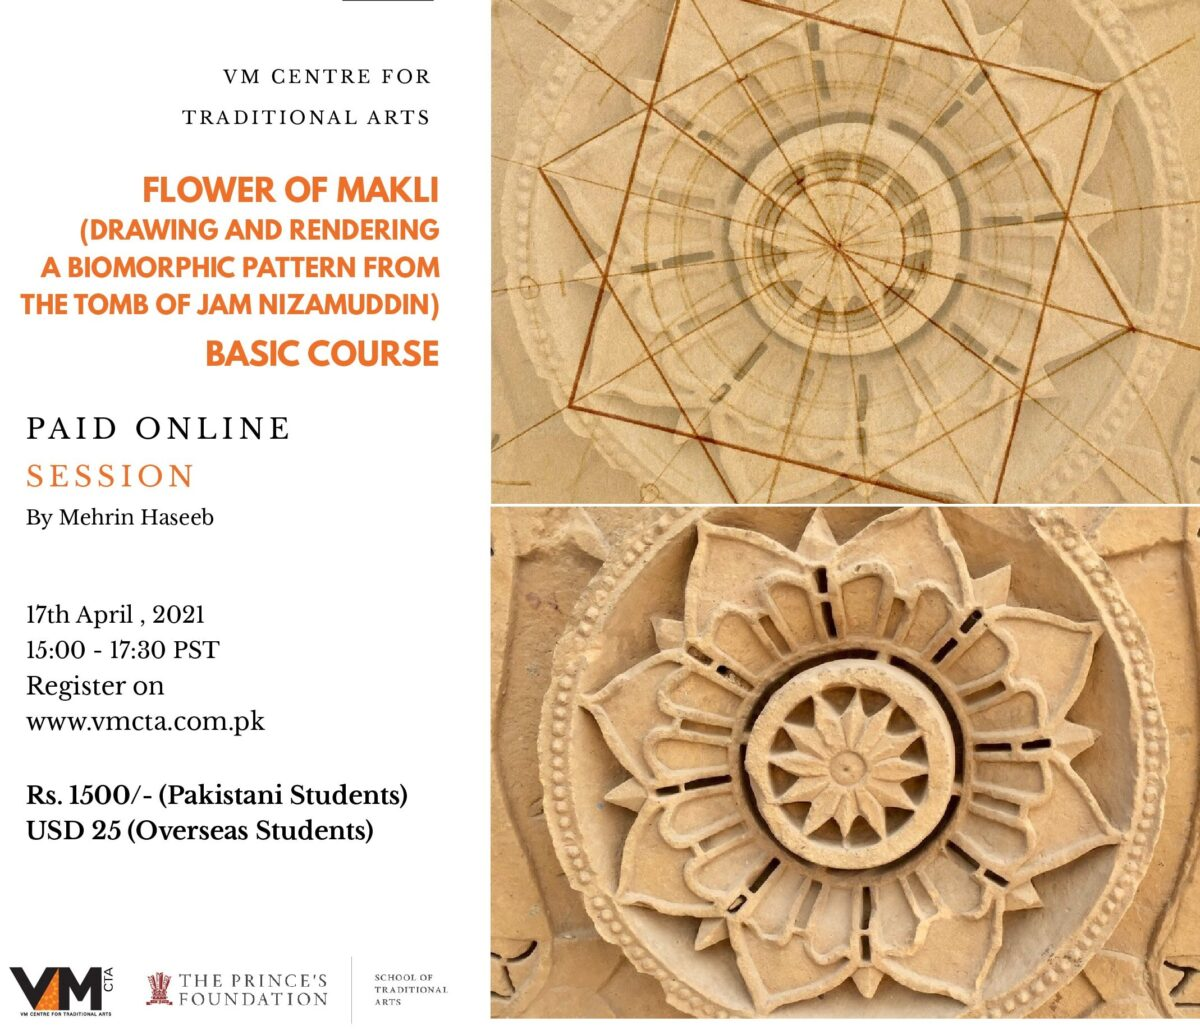 Flower of Makli 17 April 2021